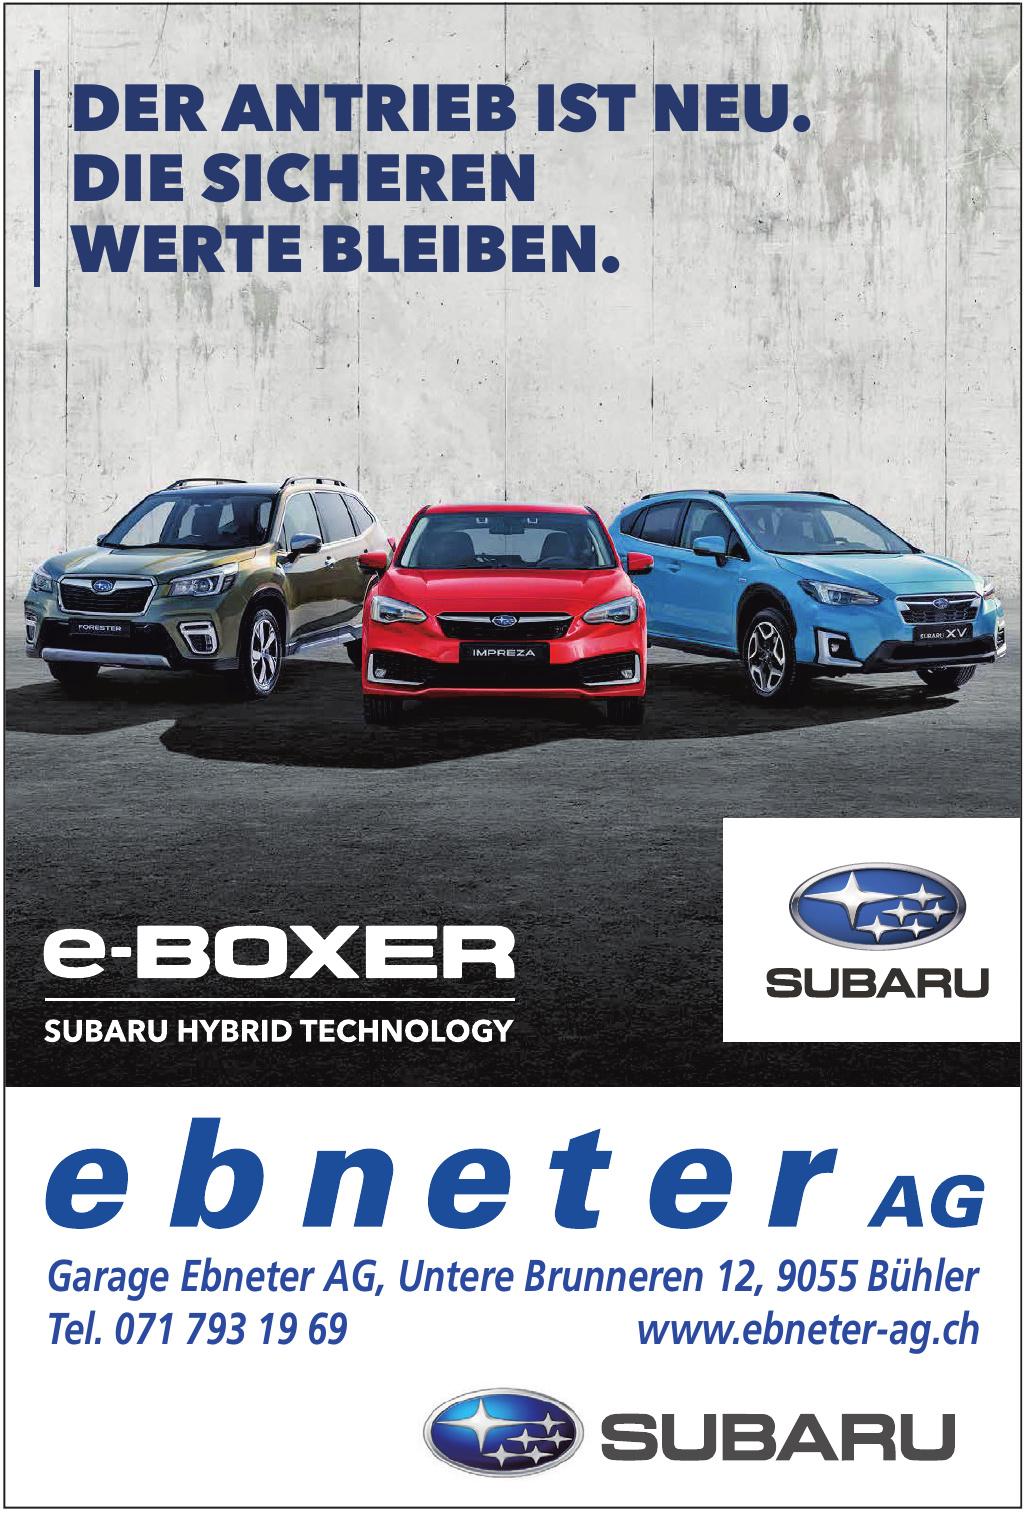 Garage Ebneter AG